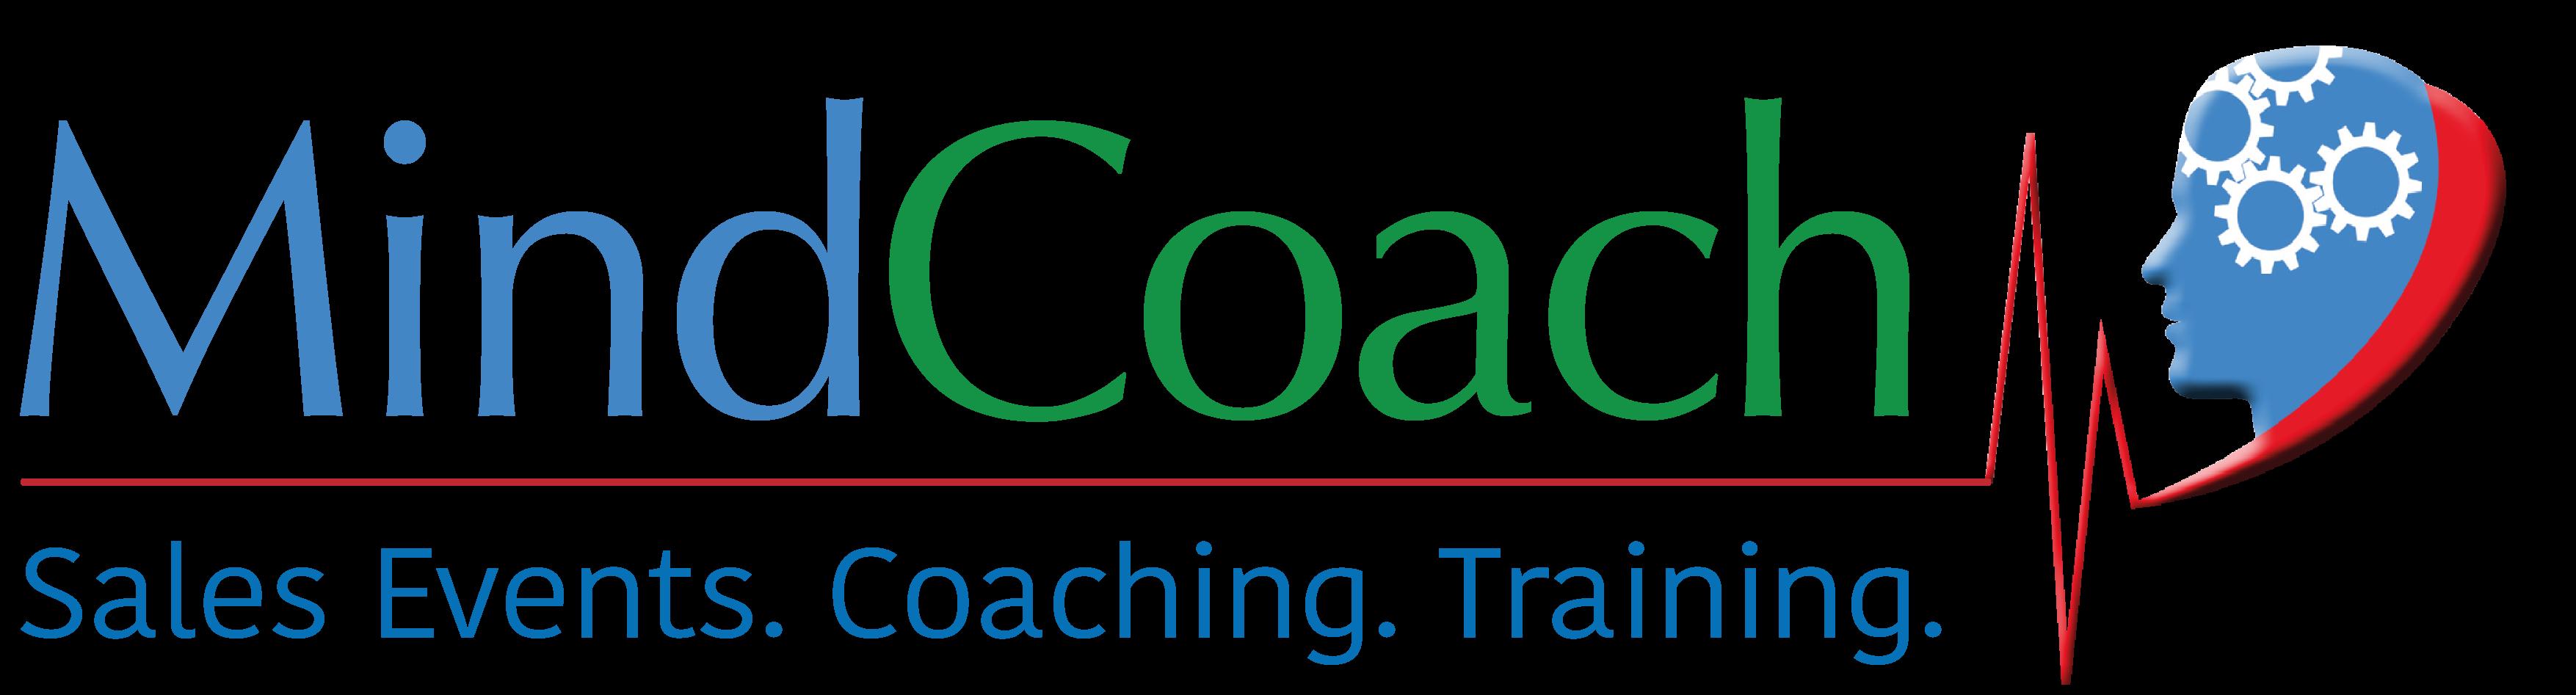 MindCoach Academy